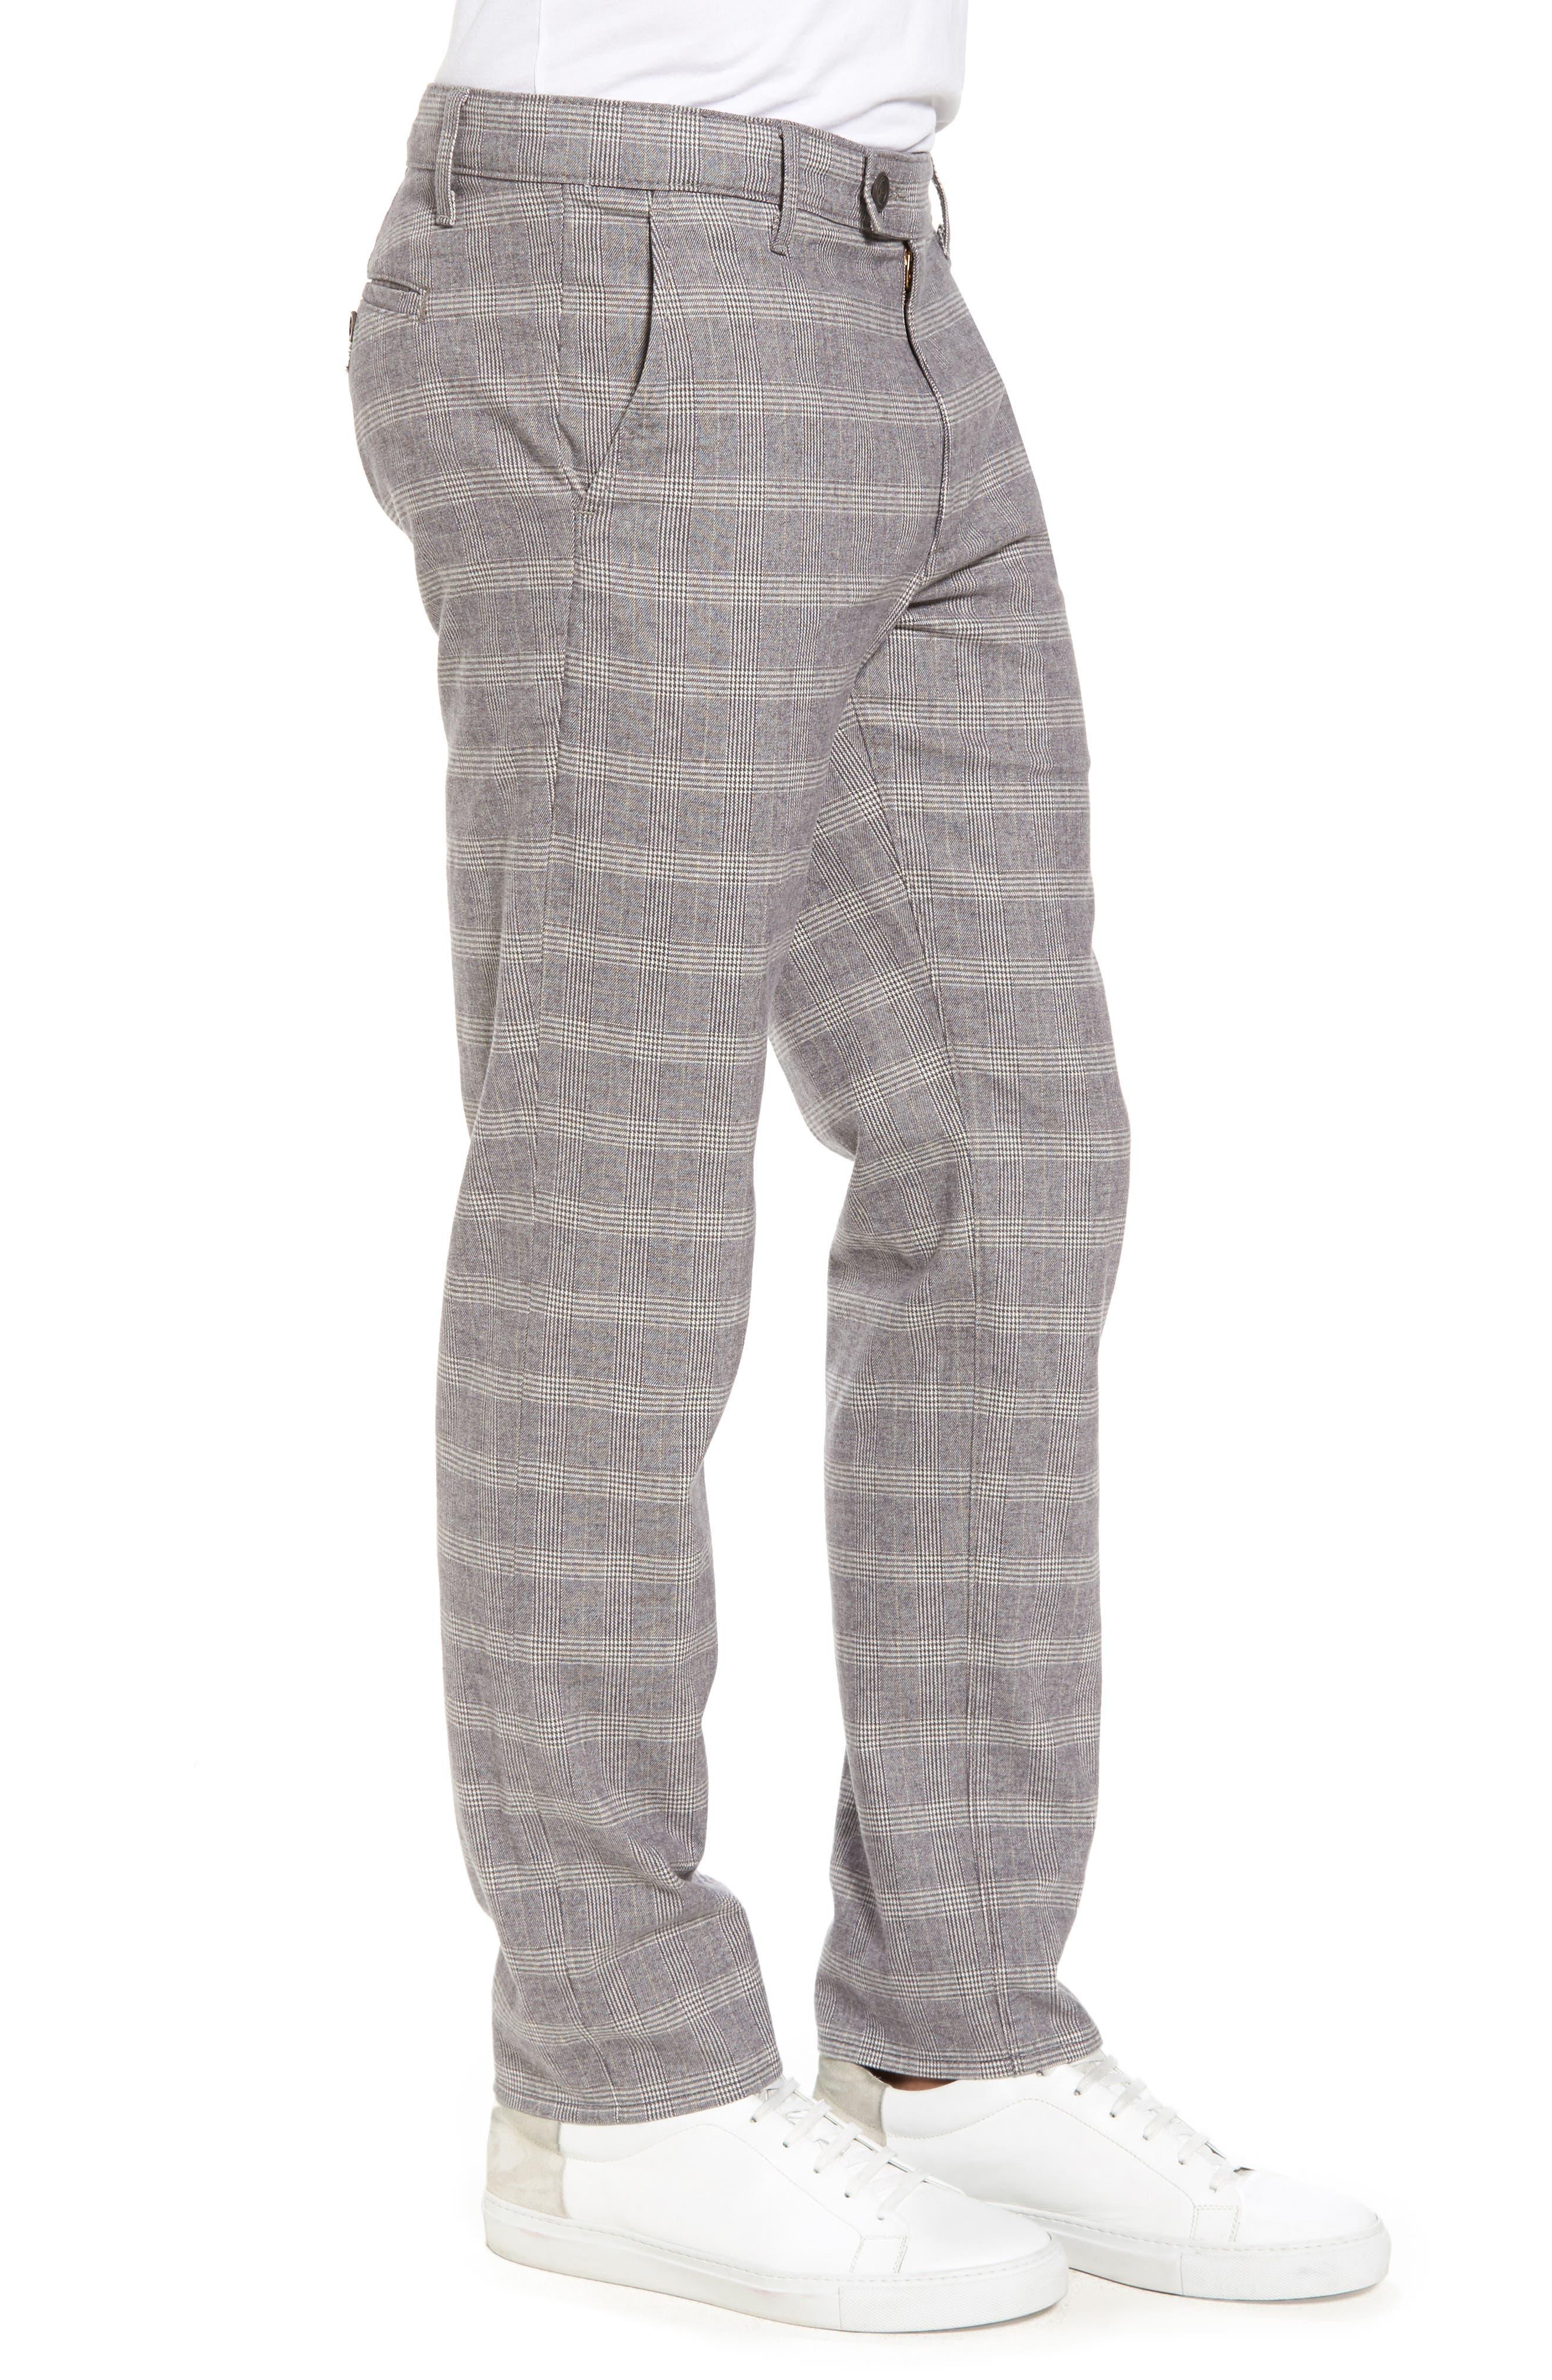 Marshall Slim Fit Pants,                             Alternate thumbnail 3, color,                             250